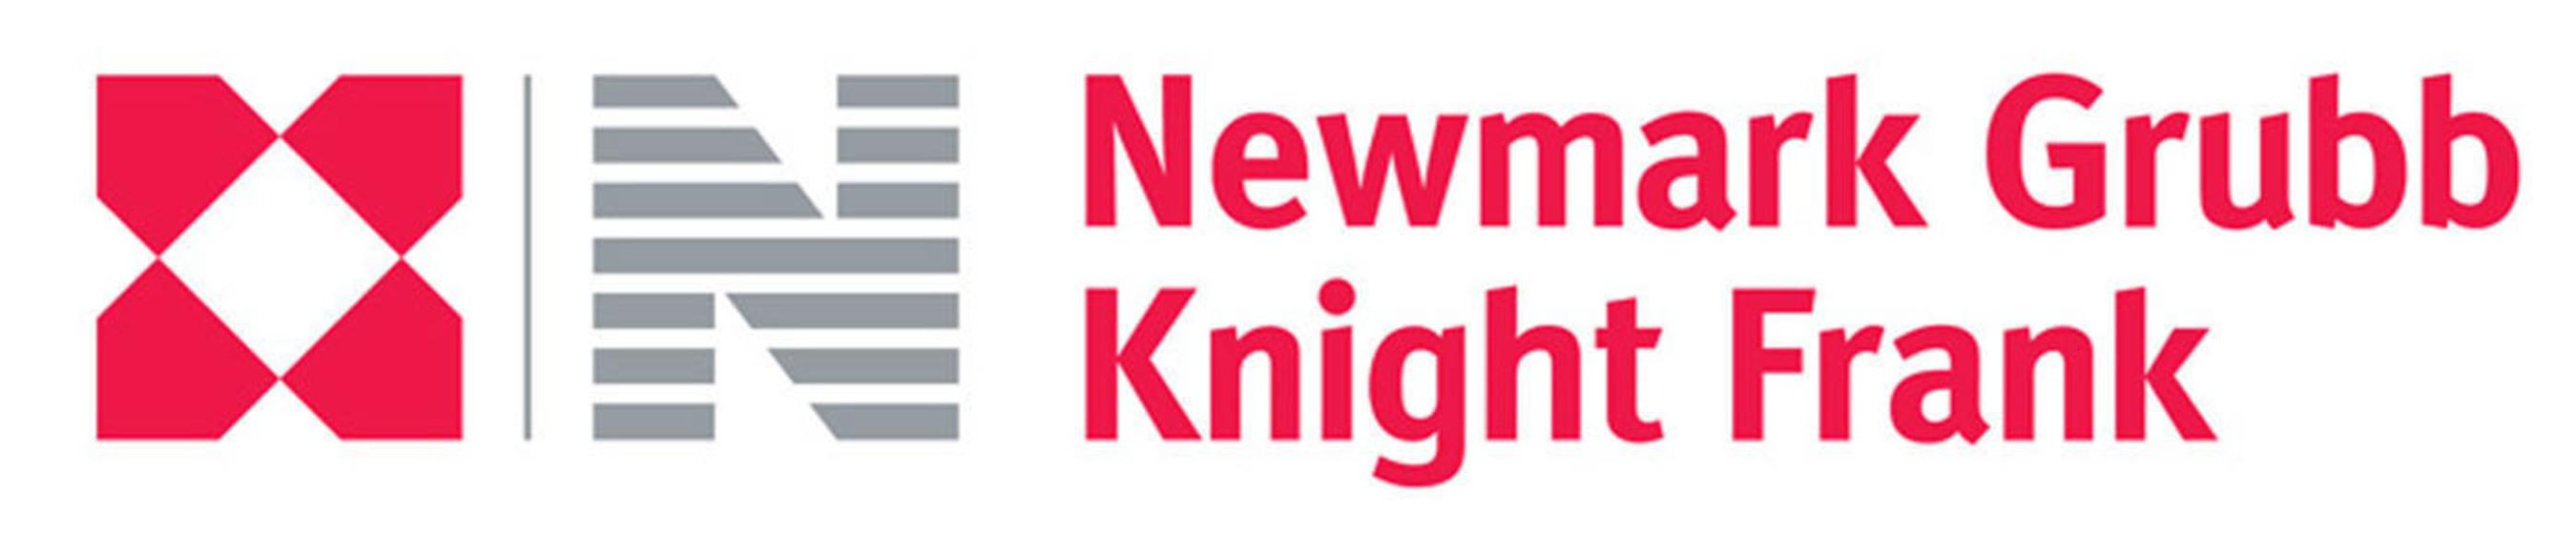 Newmark Grubb Knight Frank logo. (PRNewsFoto/Newmark Grubb Knight Frank) (PRNewsFoto/)